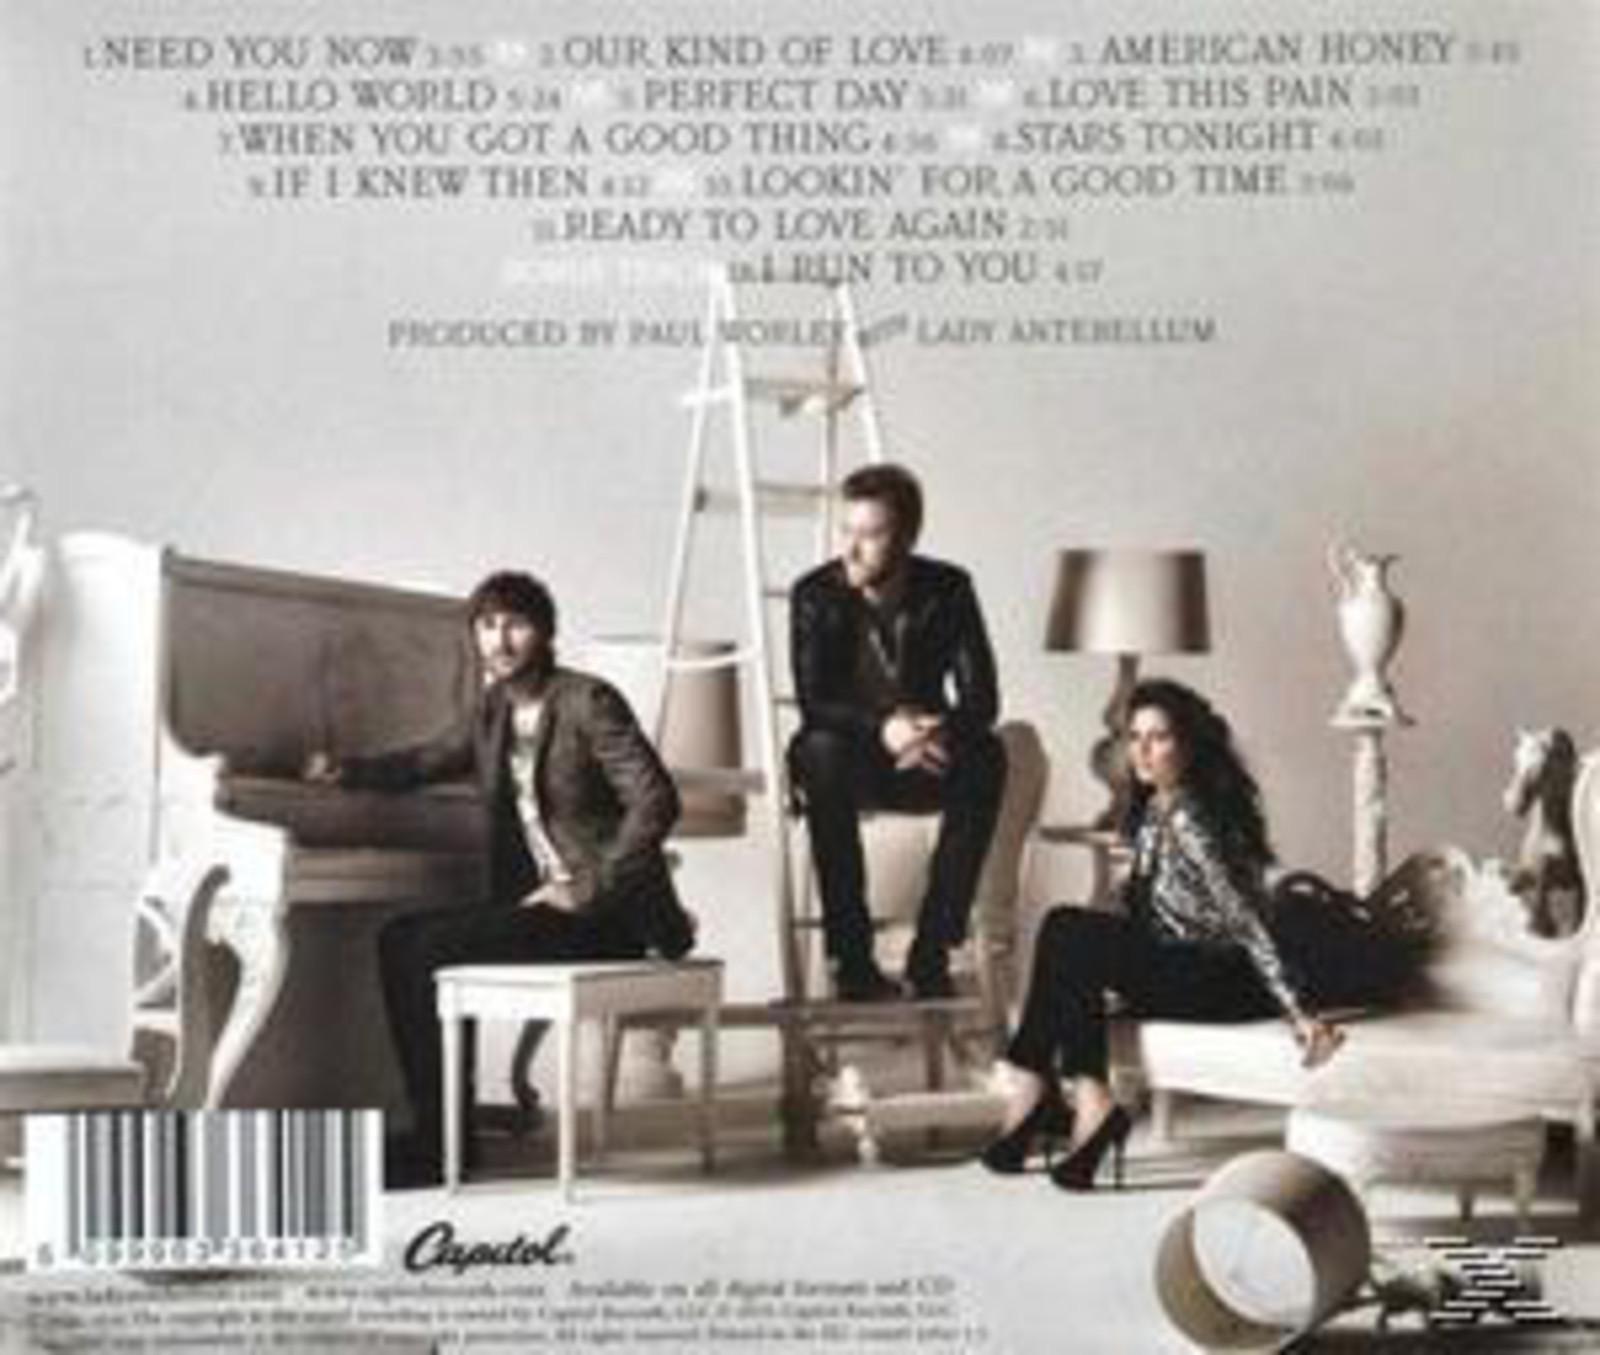 Lady Antebellum - Lady Antebellum - Need You Now [CD] 5